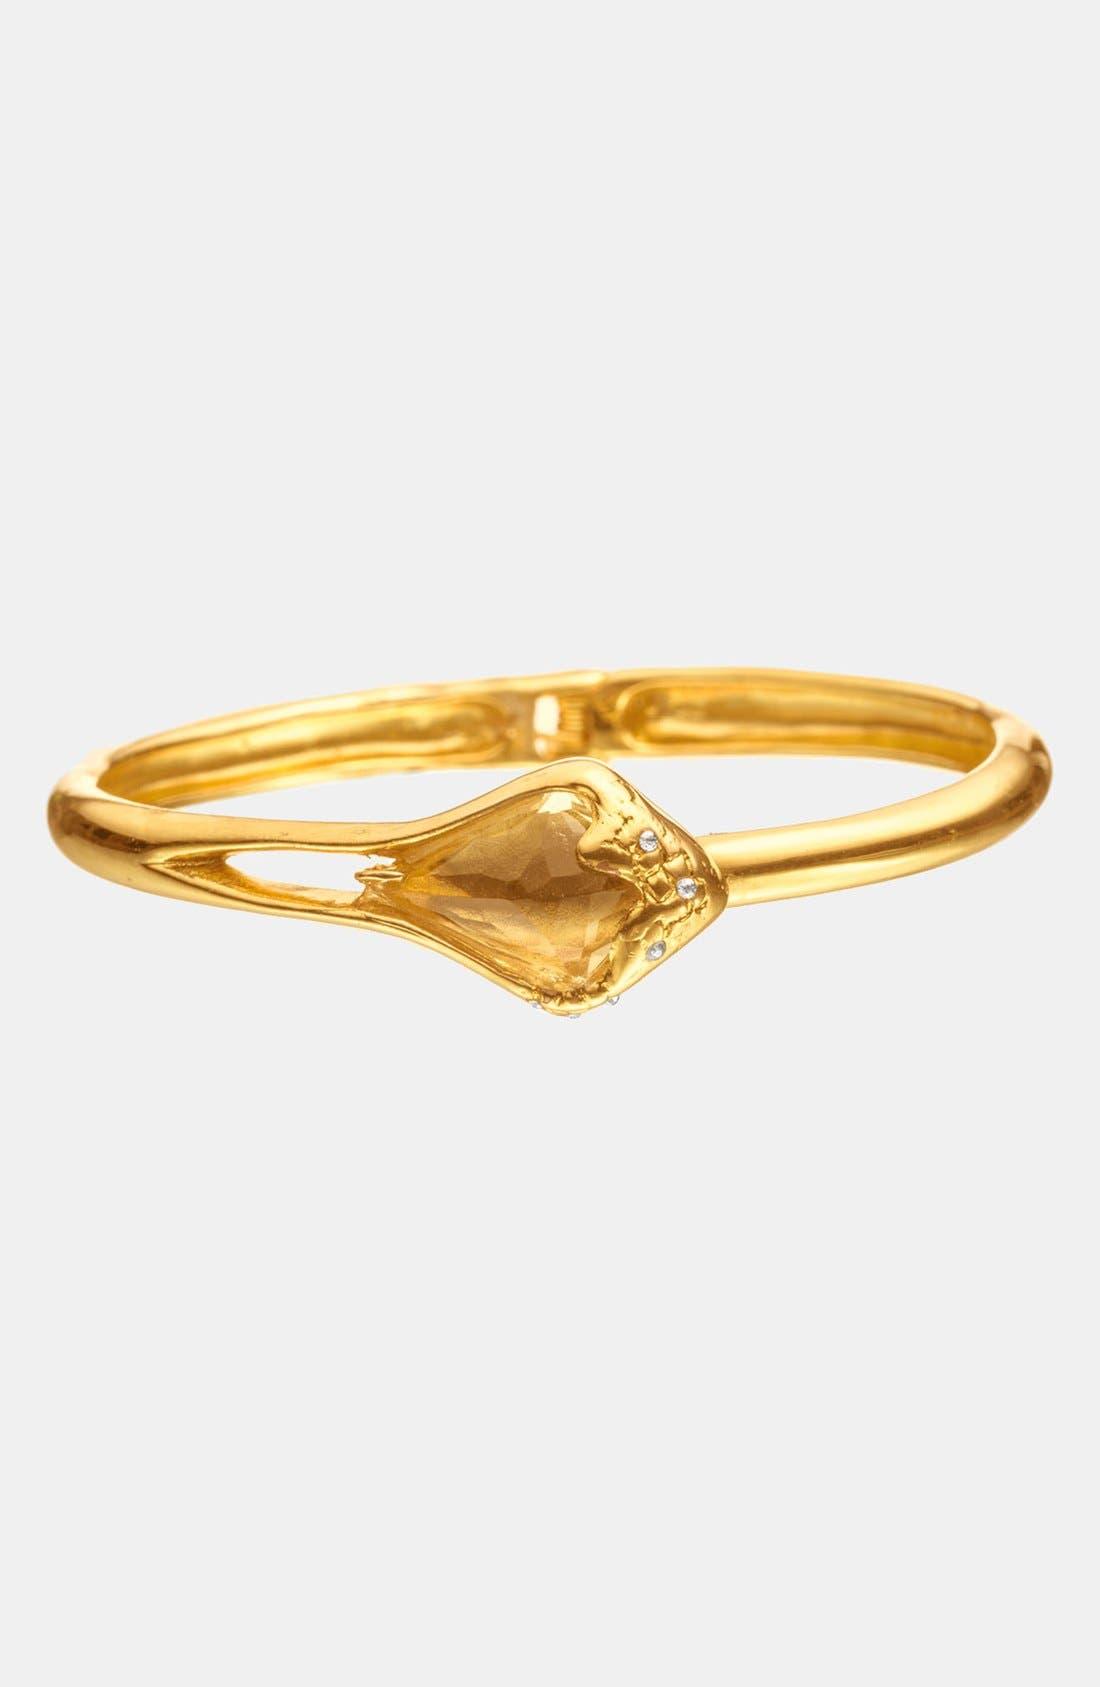 Main Image - Alexis Bittar 'Miss Havisham - Liquid Gold' Bracelet